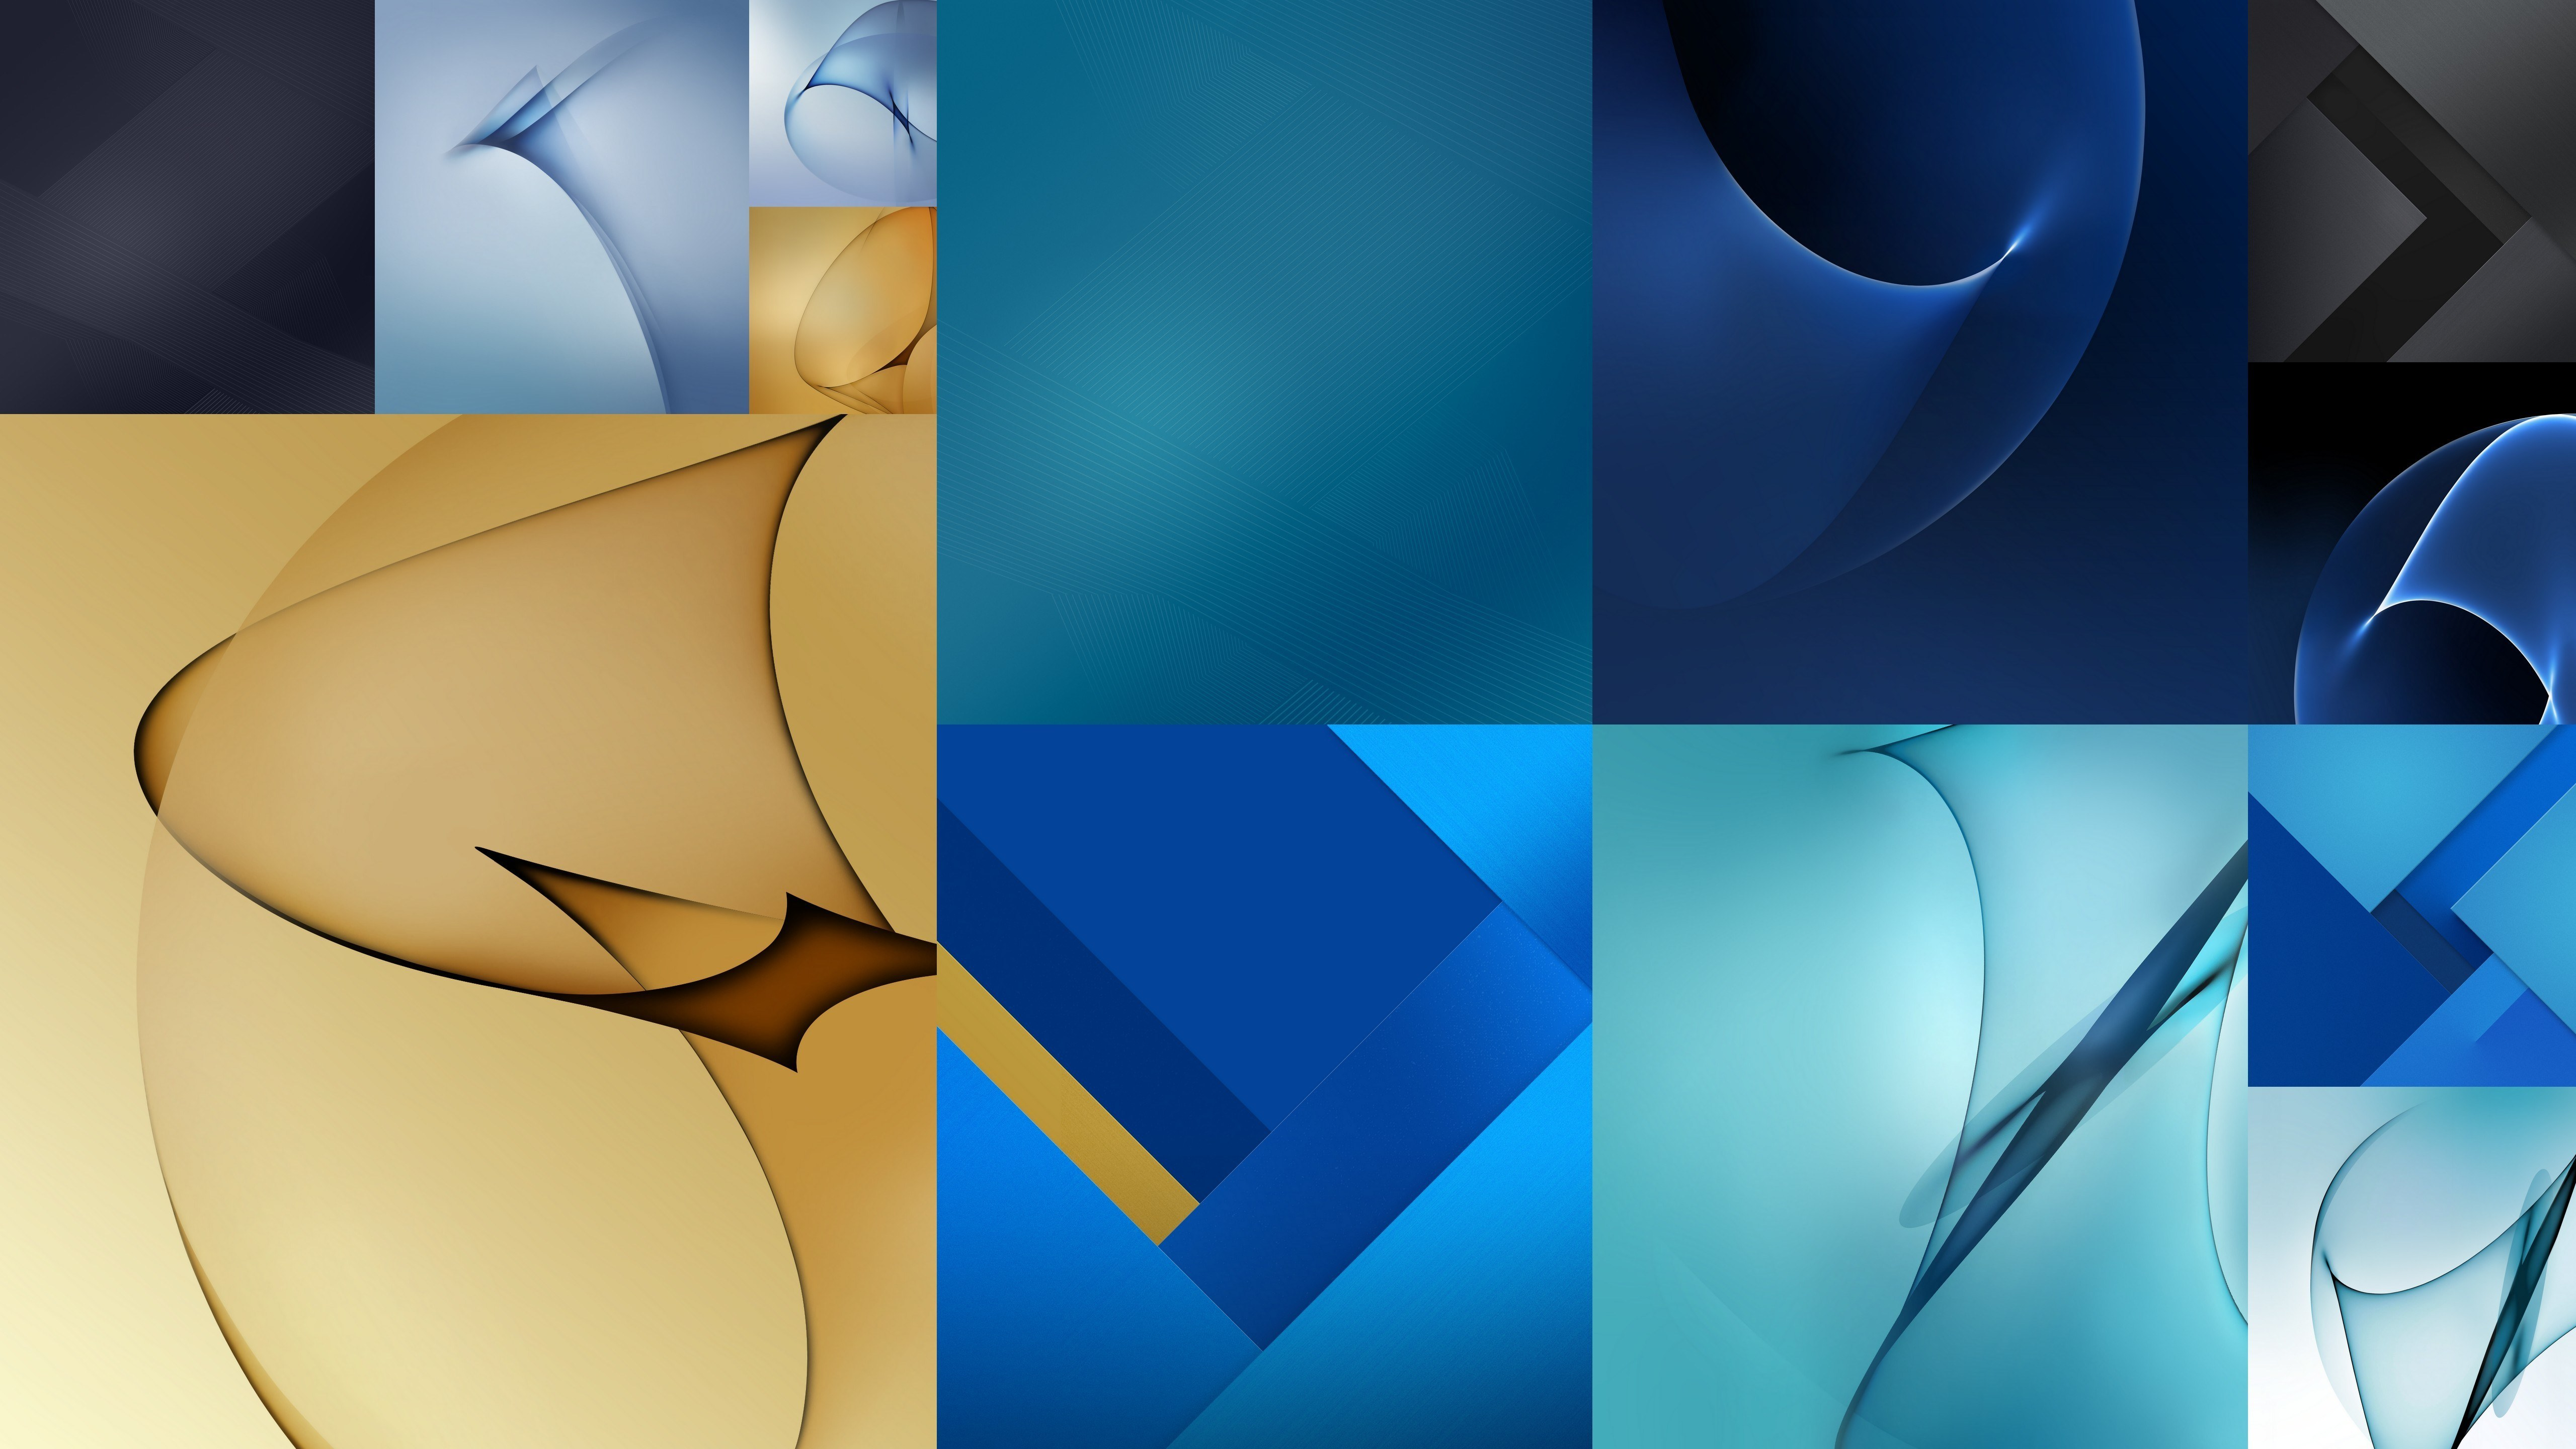 Samsung Galaxy S7 S7 Edge Stock Wallpapers Download: Samsung Galaxy S7 And S7 Edge Stock Wallpapers Download